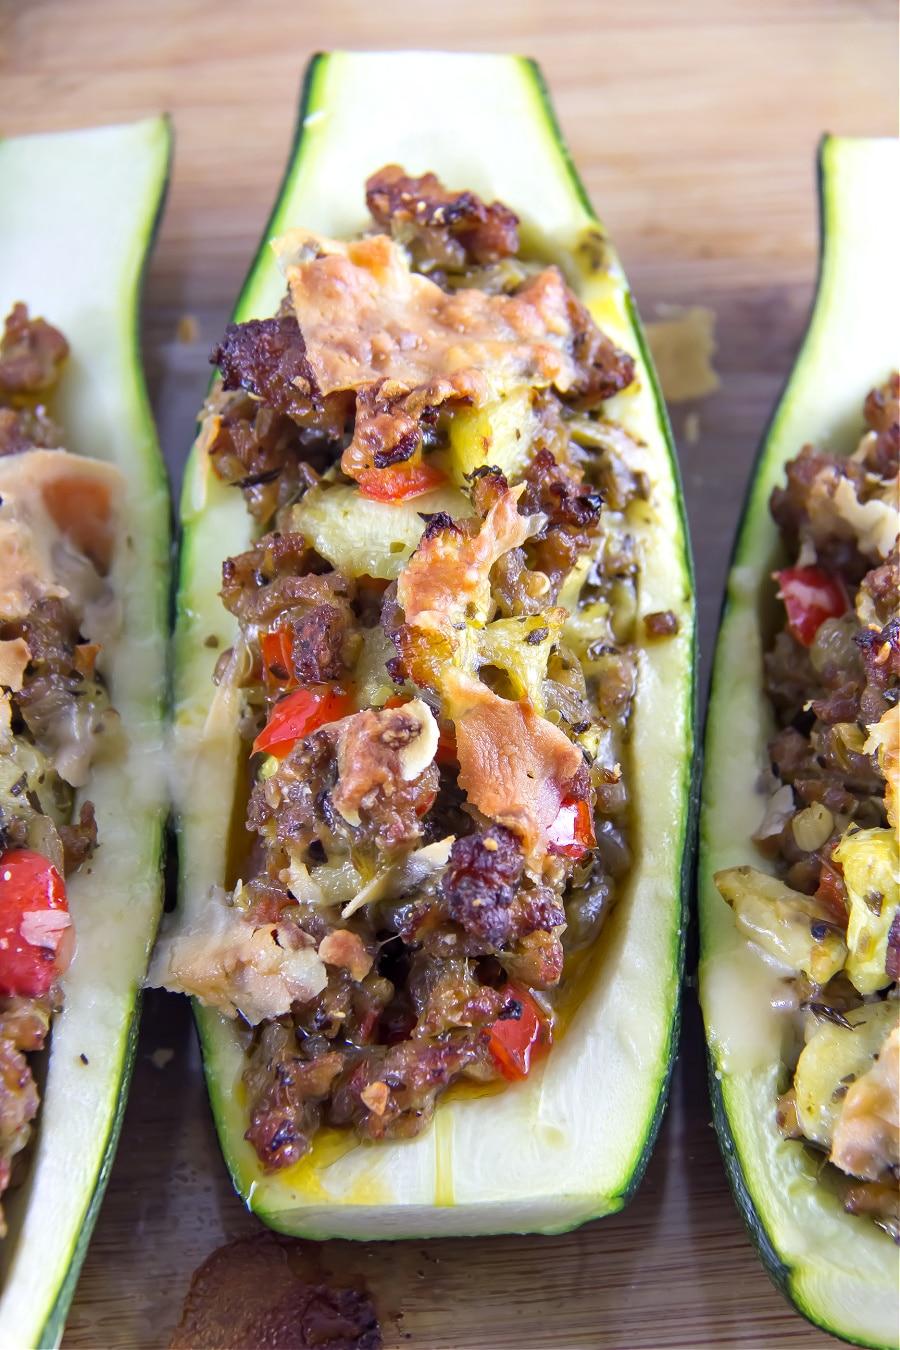 Zucchini boats recipe stuffed with mild Italian sausage.